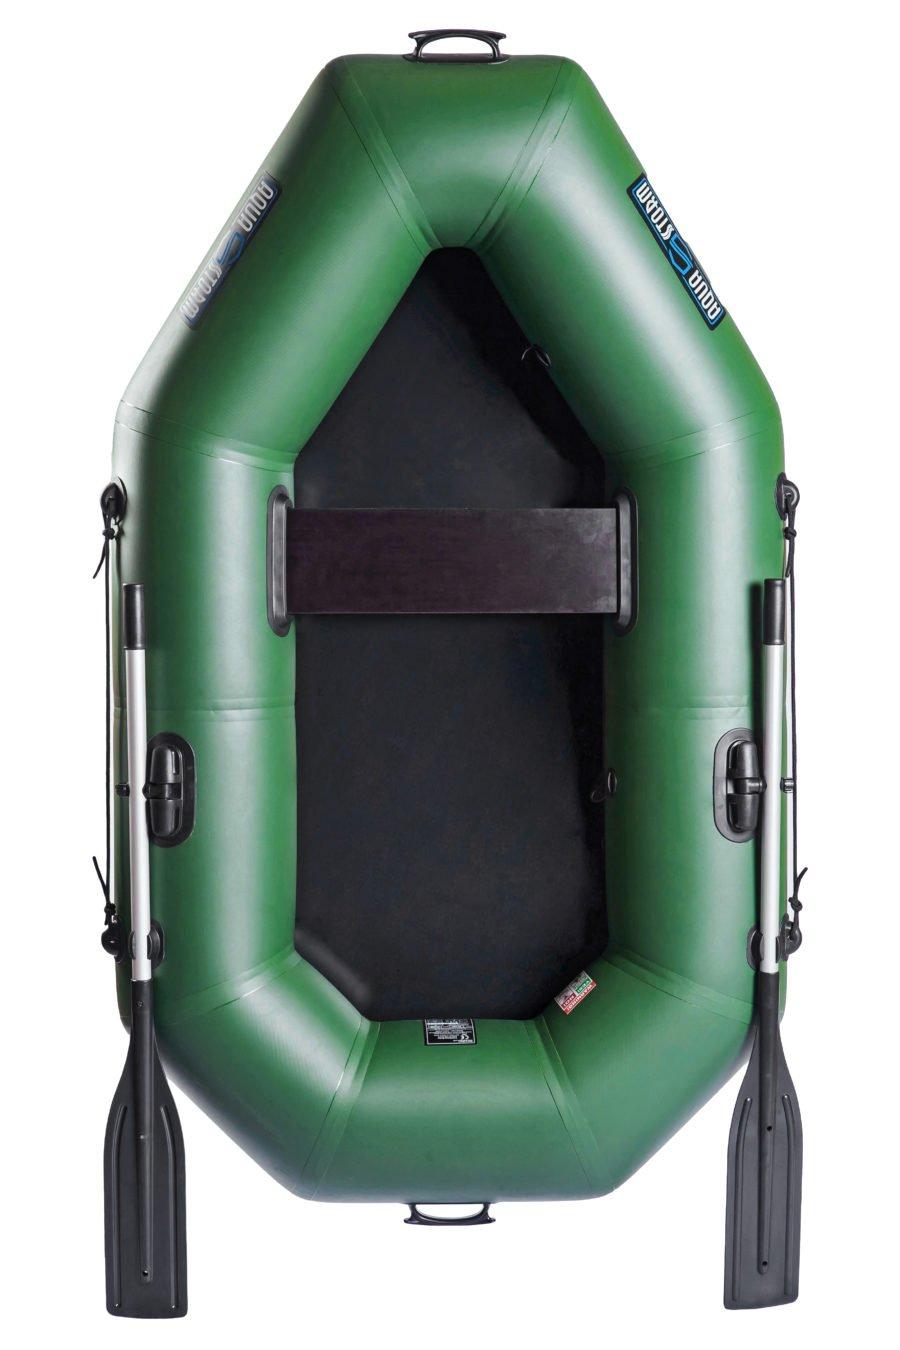 Надувная лодка Aqua-Storm St220CK слань-книжка